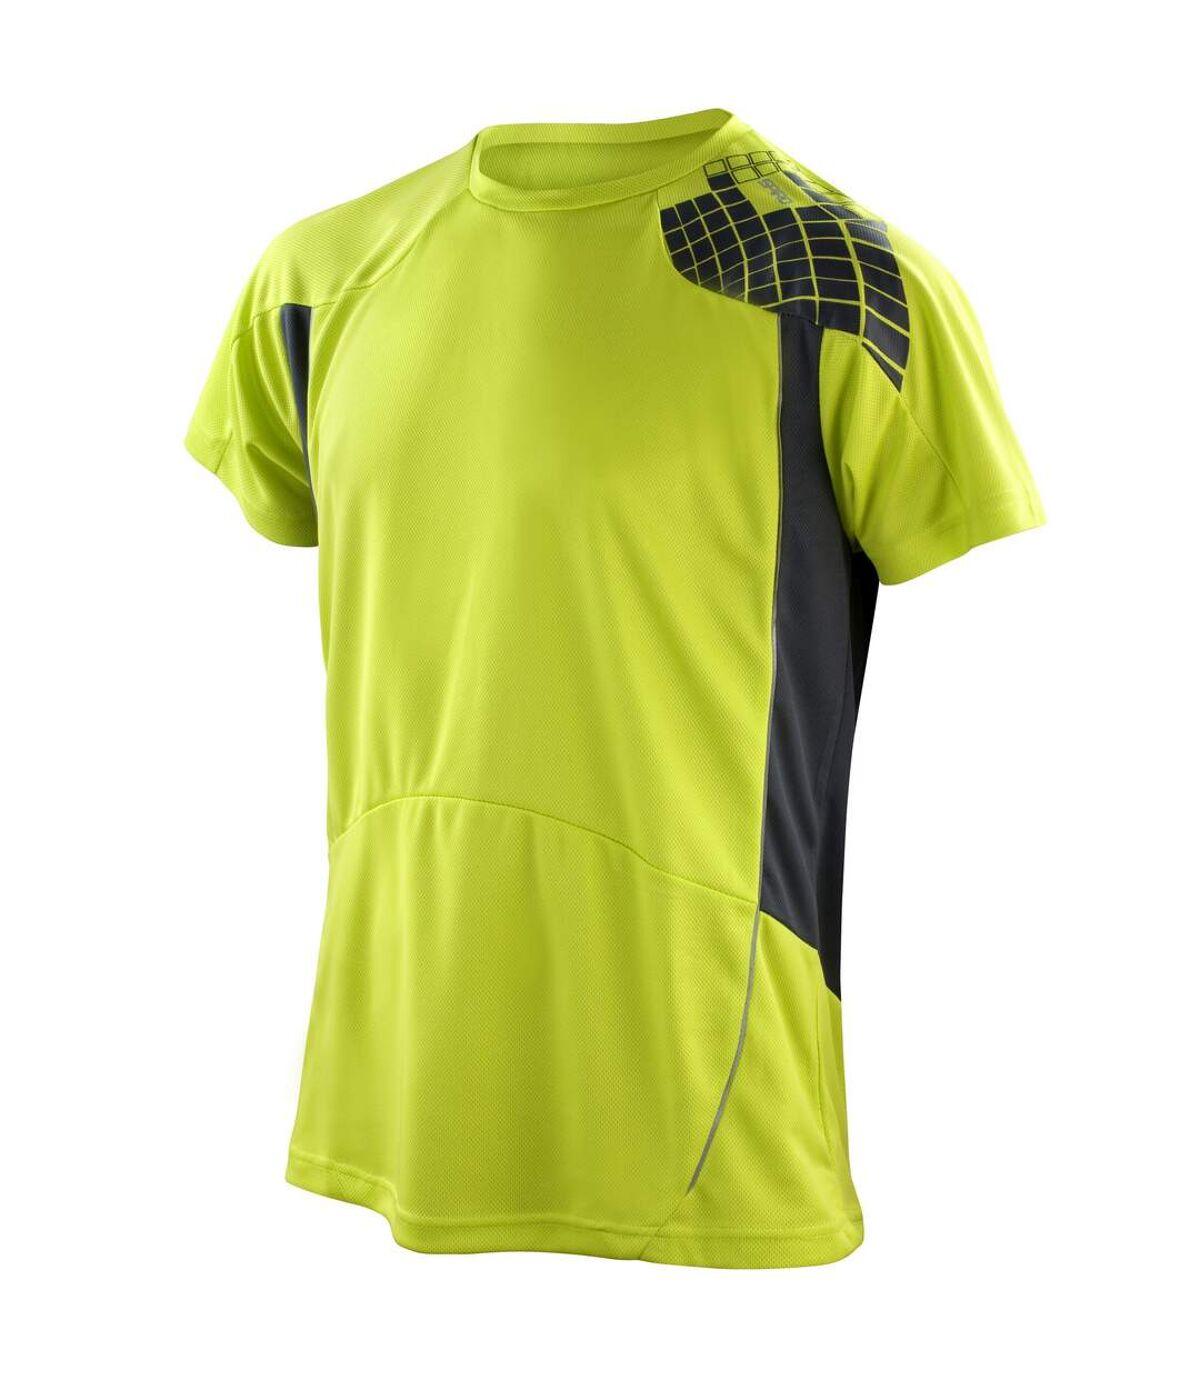 Spiro Mens Performance Sports Lightweight Athletic Training T-Shirt (Black/Grey) - UTRW1468